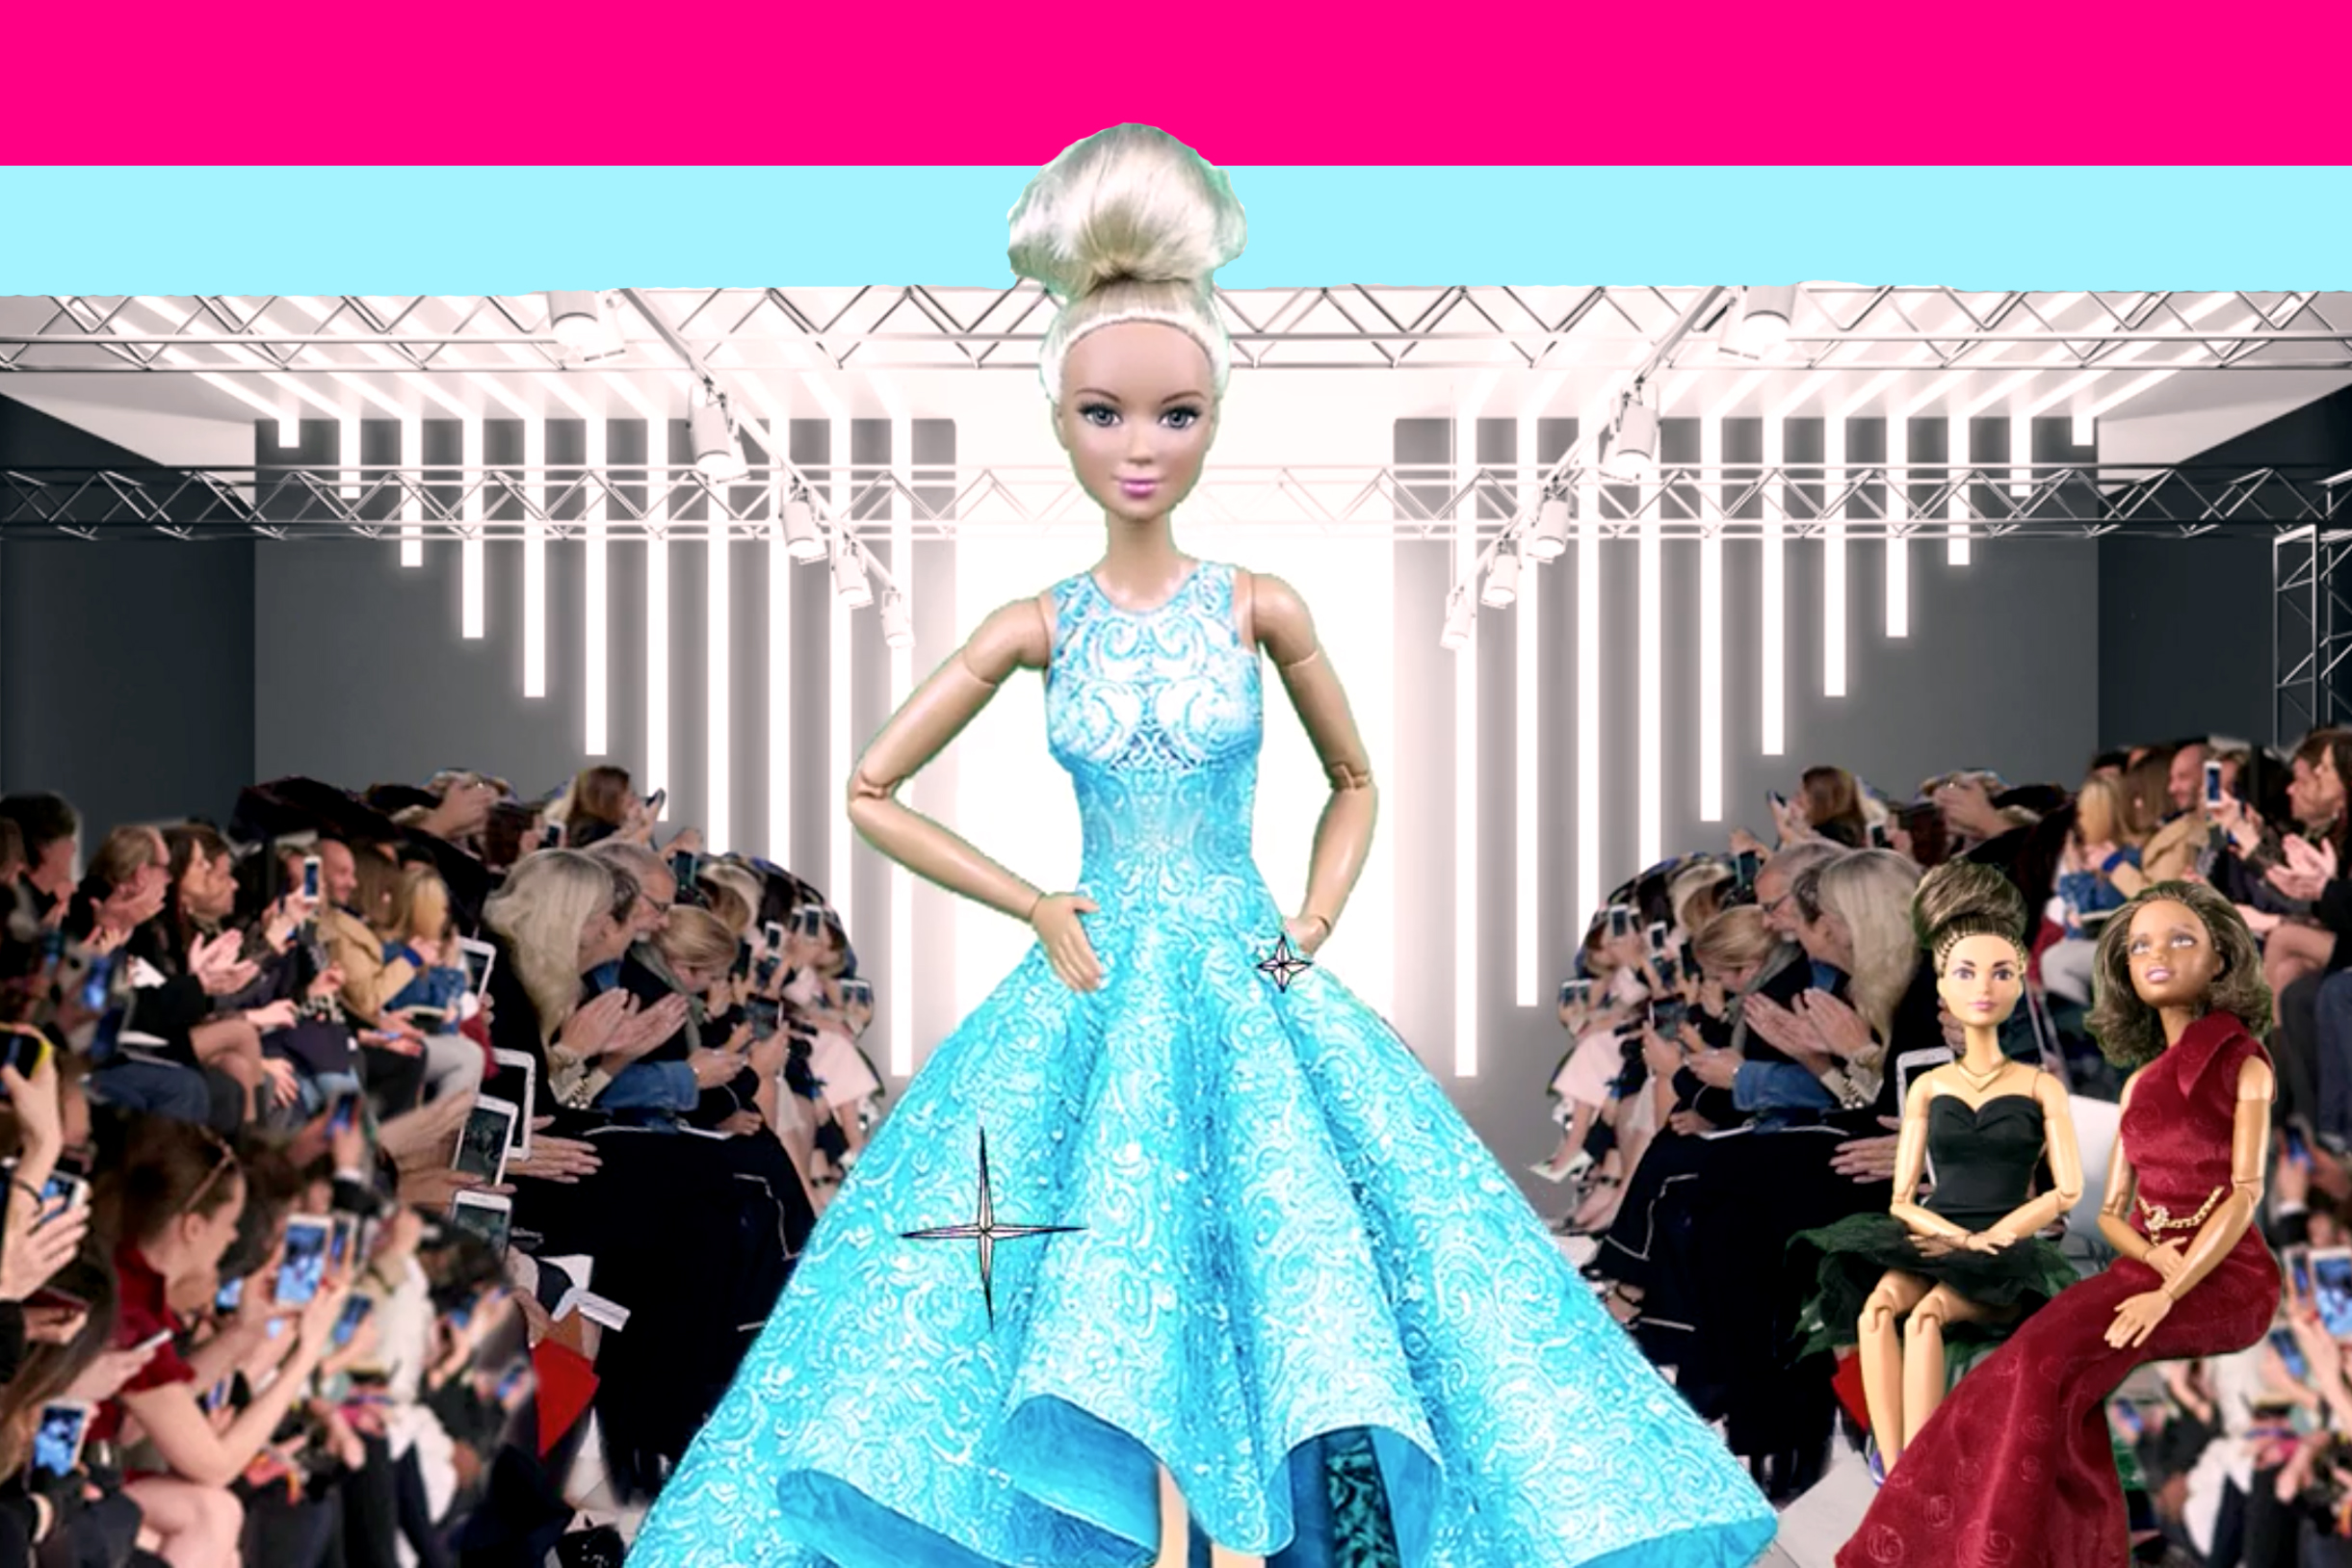 #2 The Contest | Kimberly, Perla & Vanessa at the Doll City Fashion Show